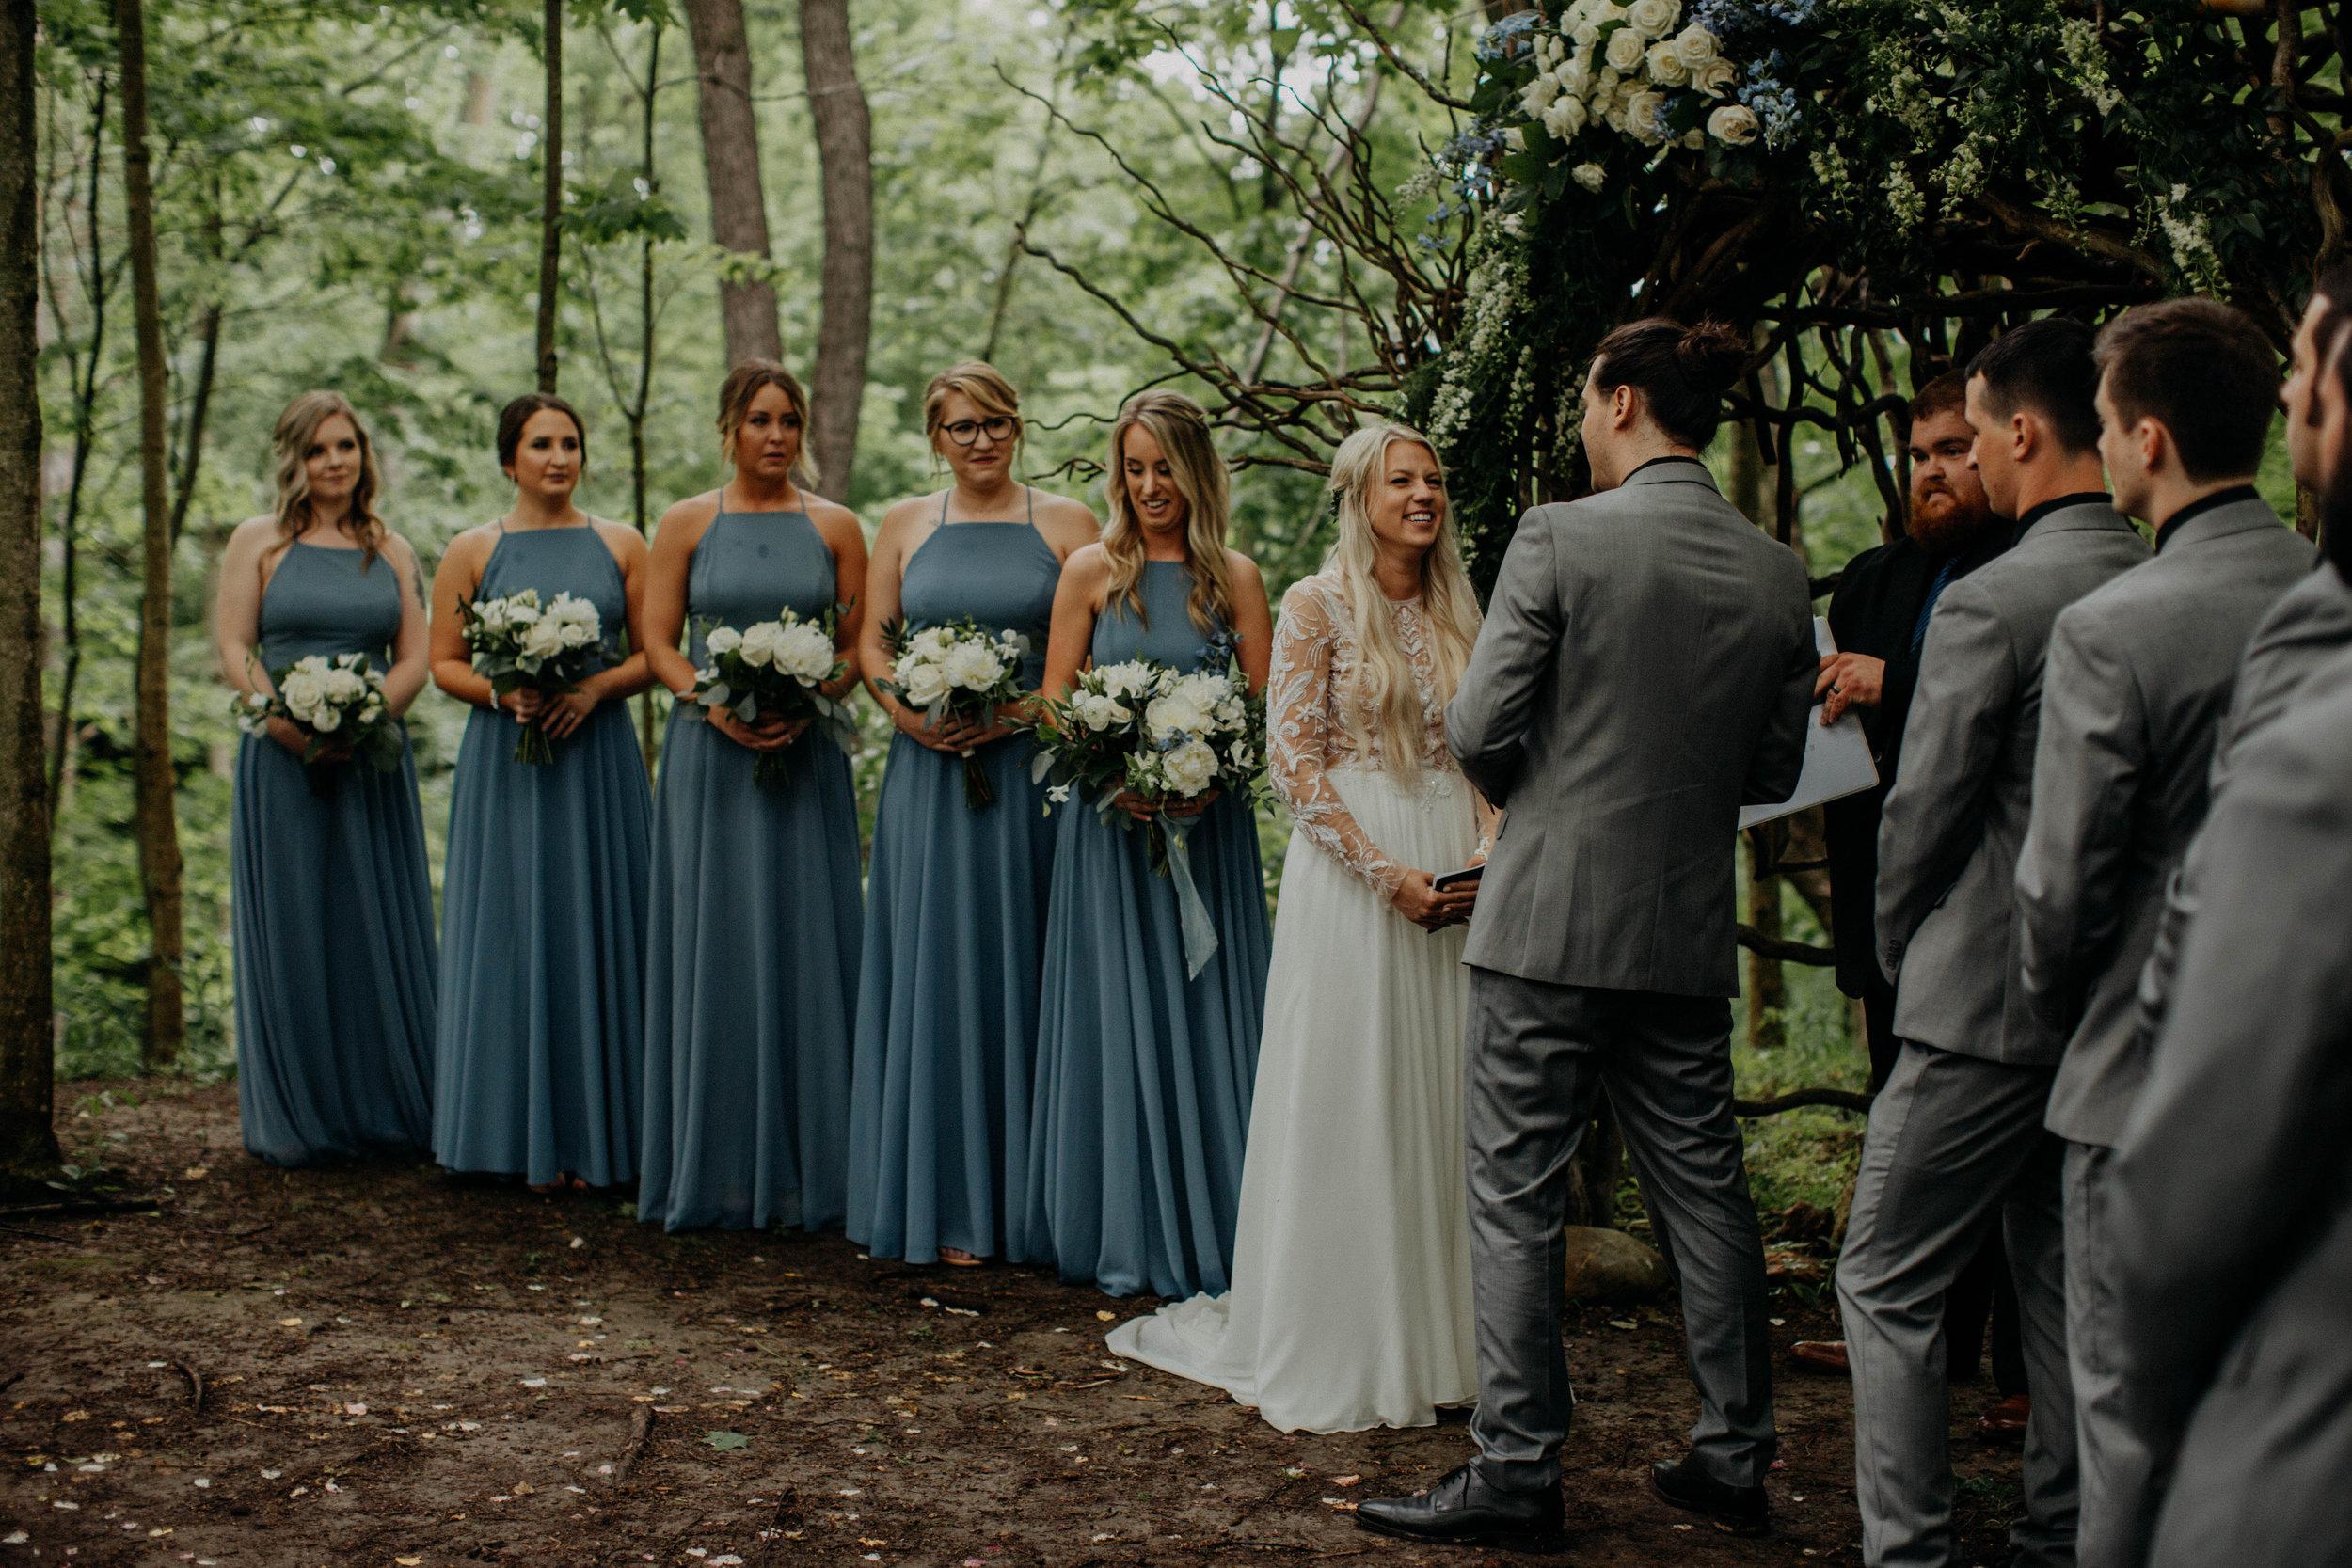 Columbus ohio wedding photographer canyon run ranch wedding grace e jones photography wedding photographer46.jpg